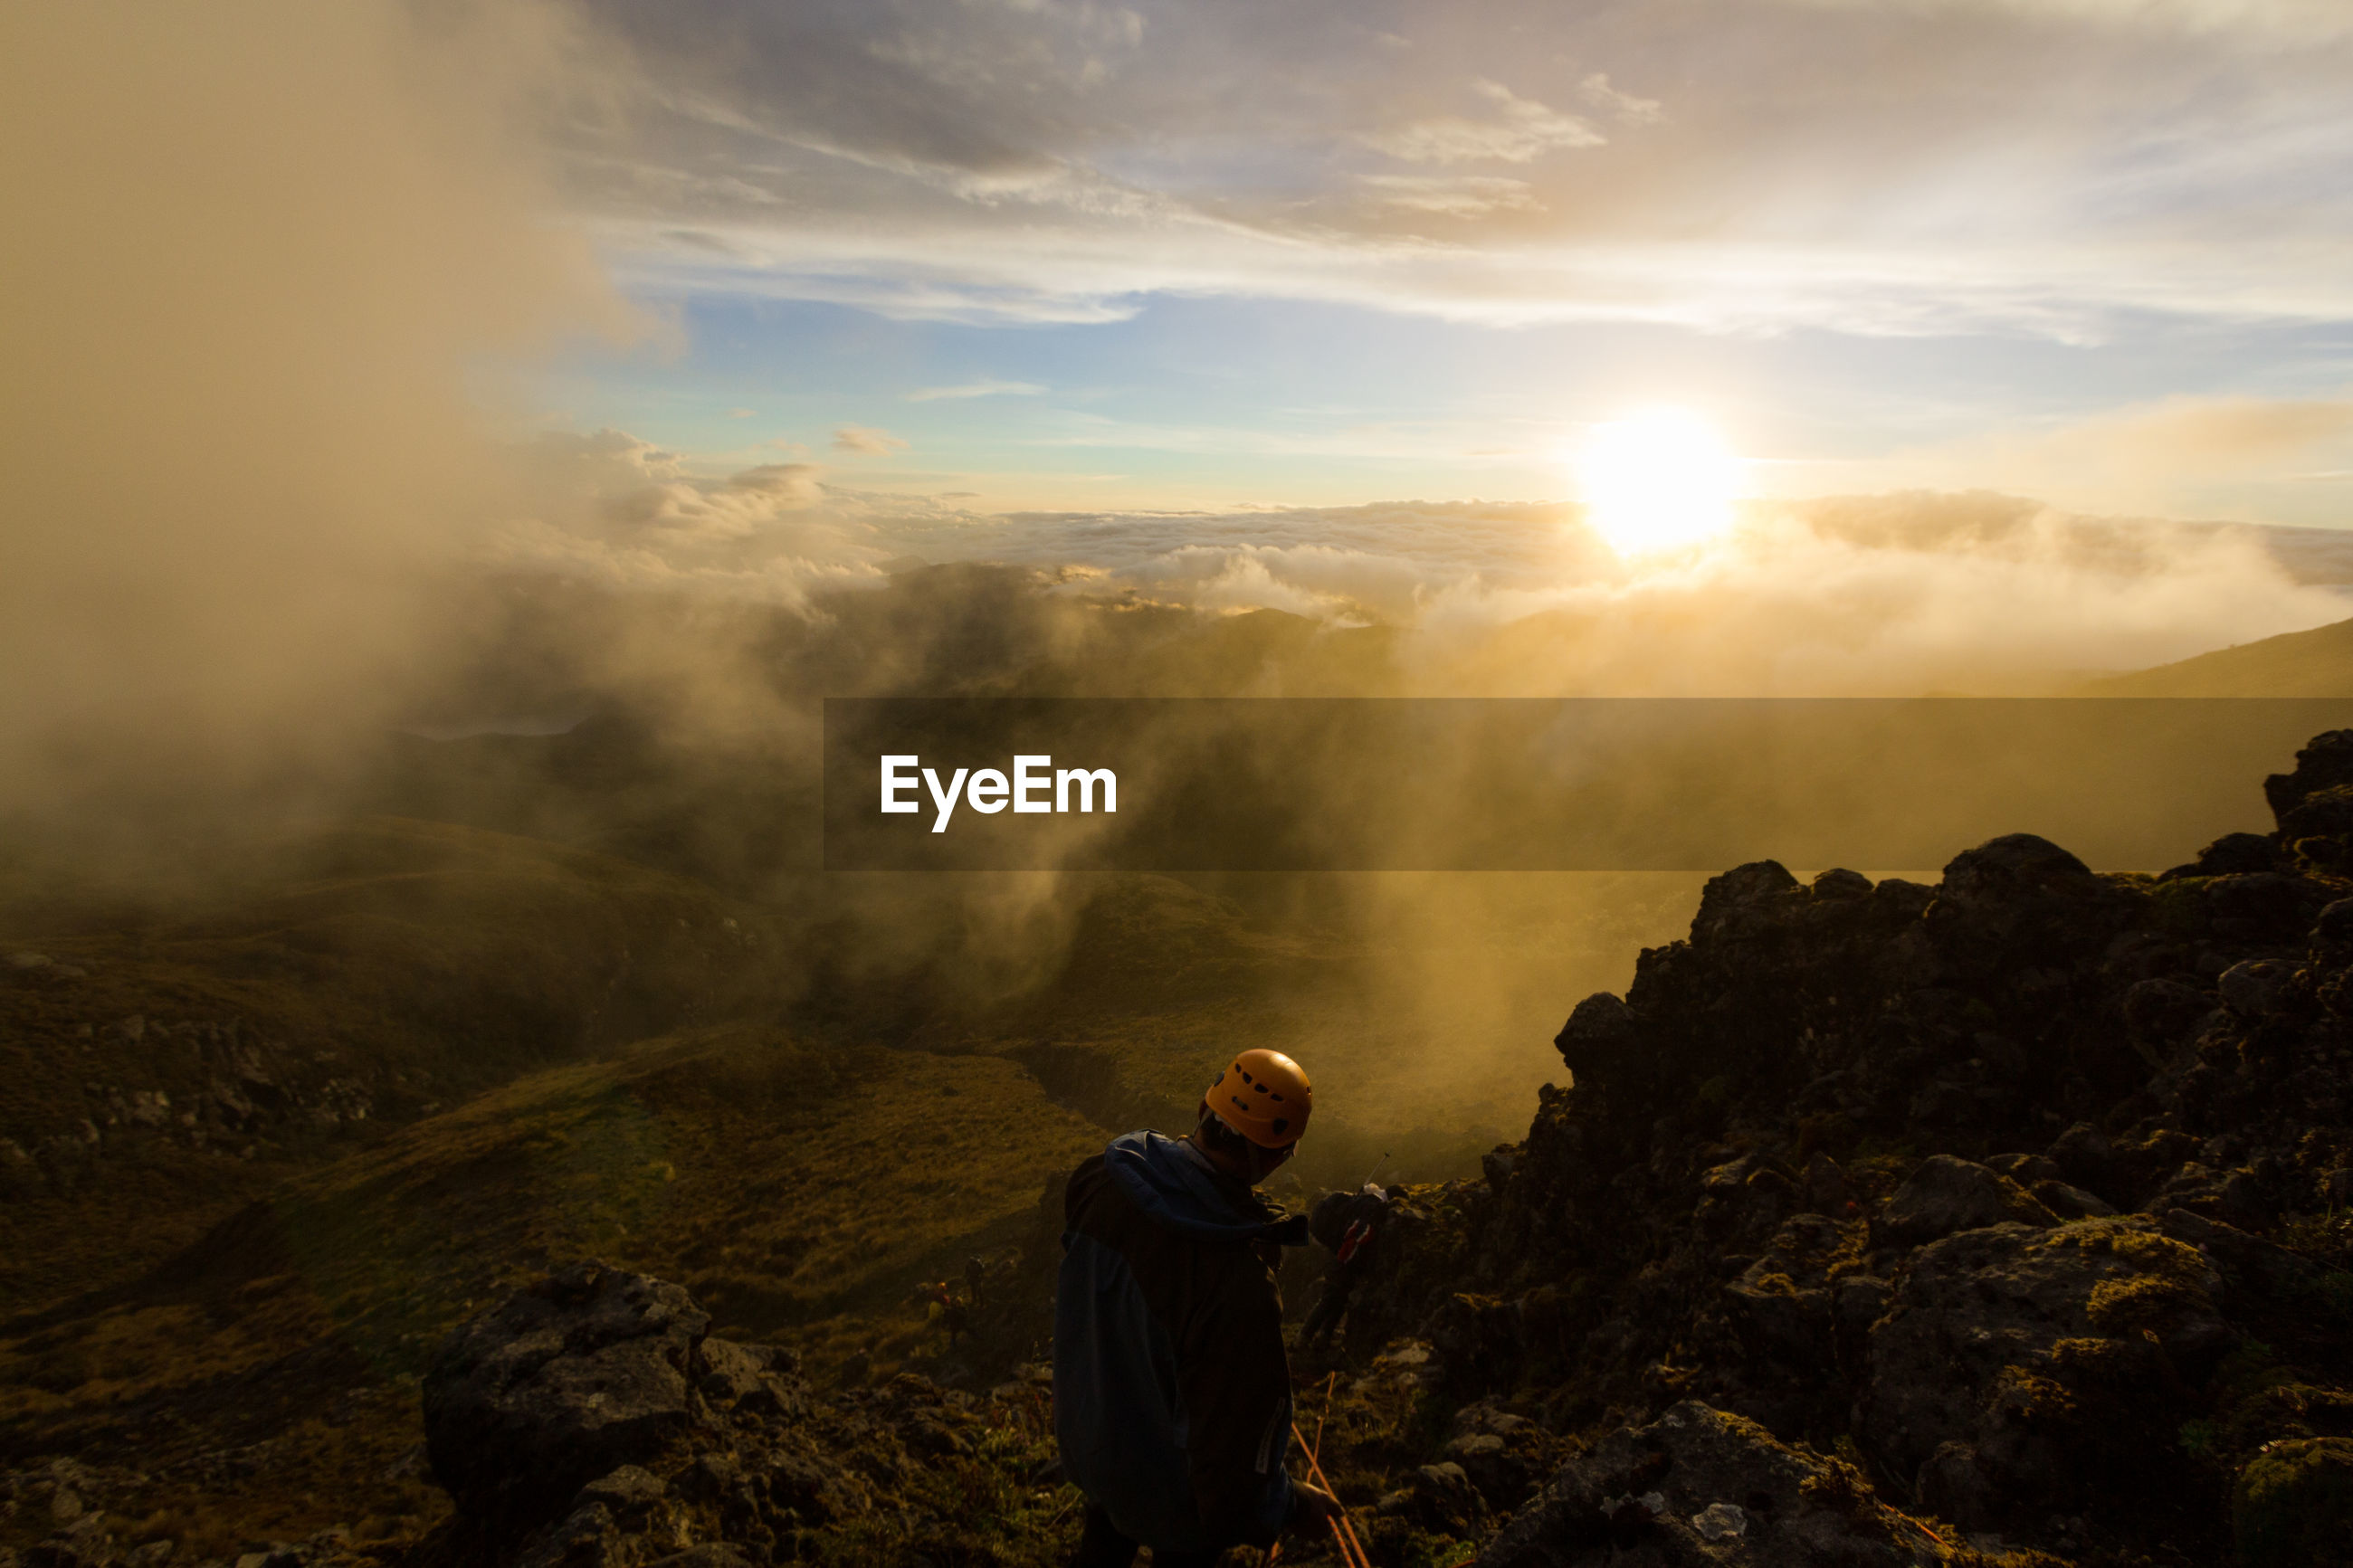 Man walking on mountain against sky during sunset